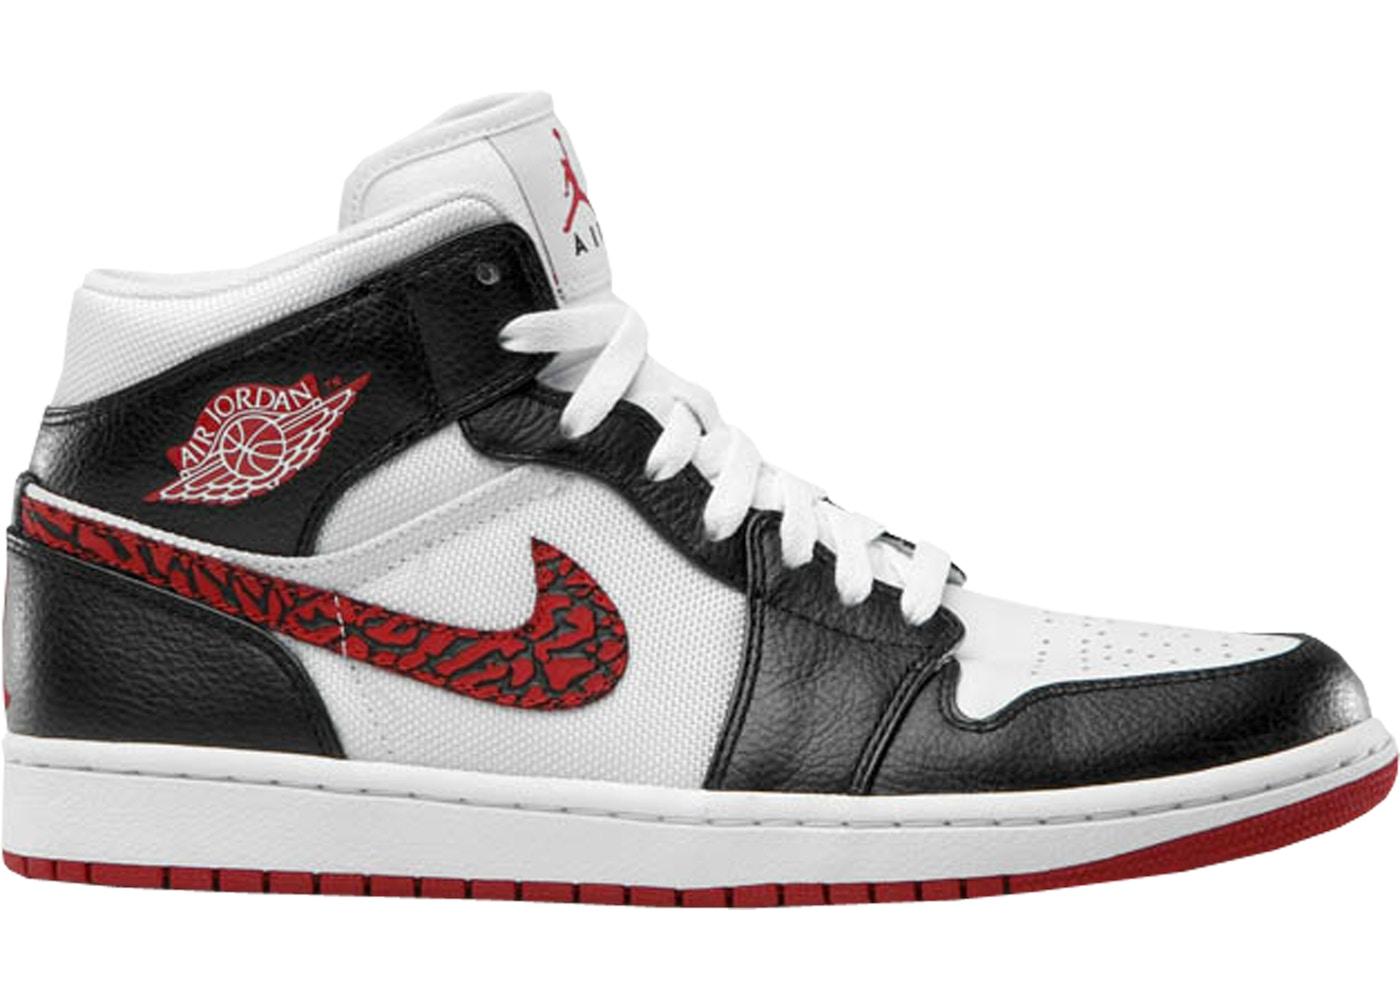 quality design 60e72 9f02b Jordan 1 Phat White Red Black (Elephant Print) - 364770-110